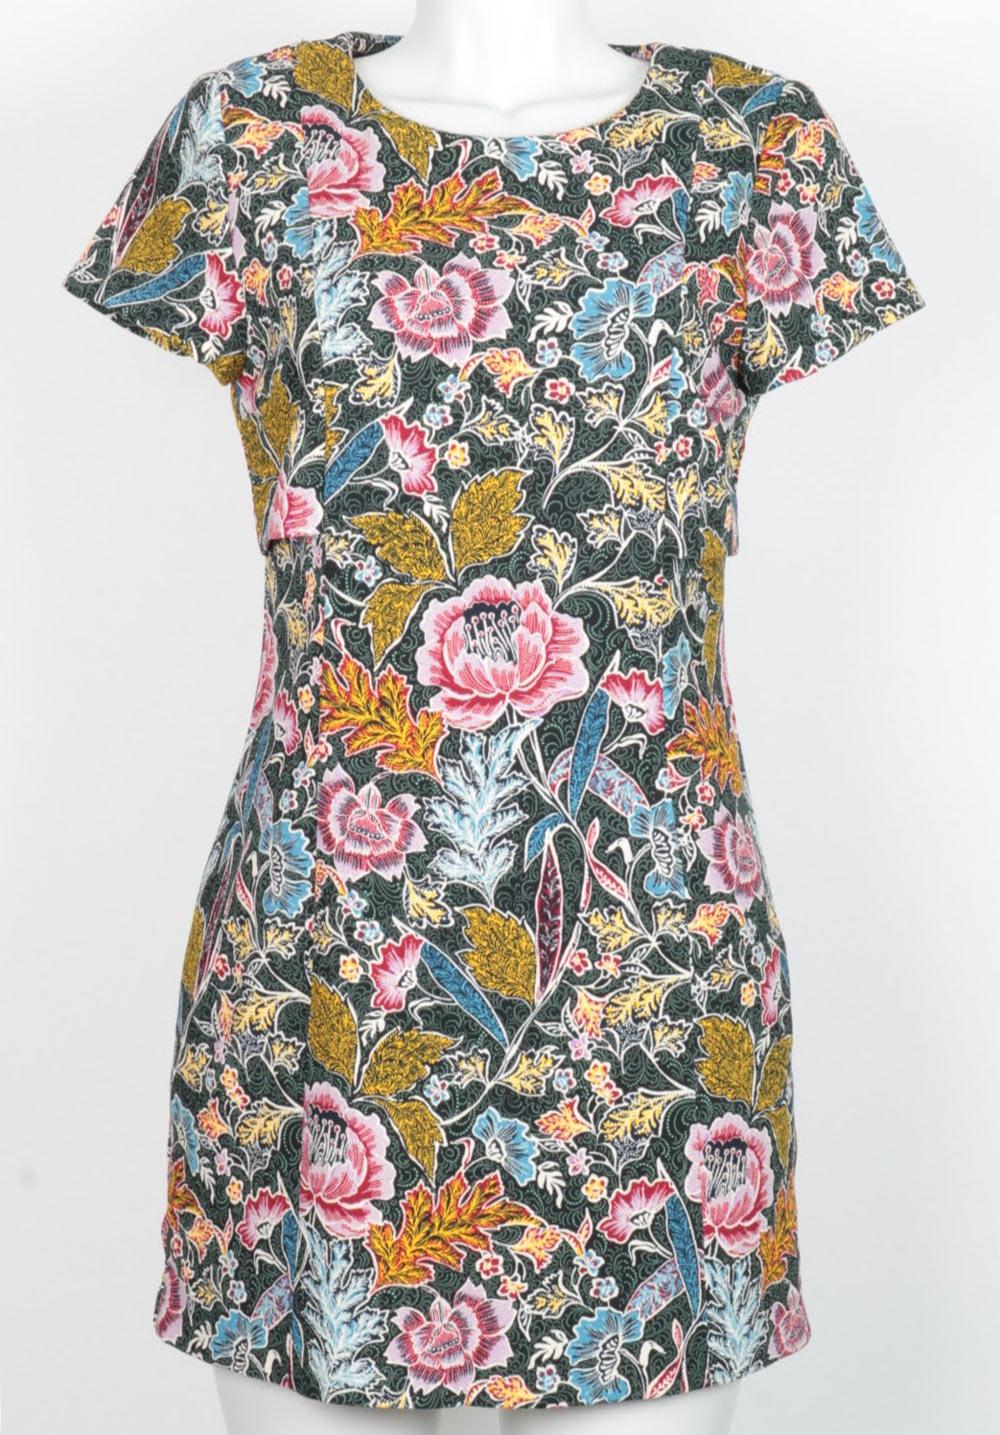 Vestido - Zara - G